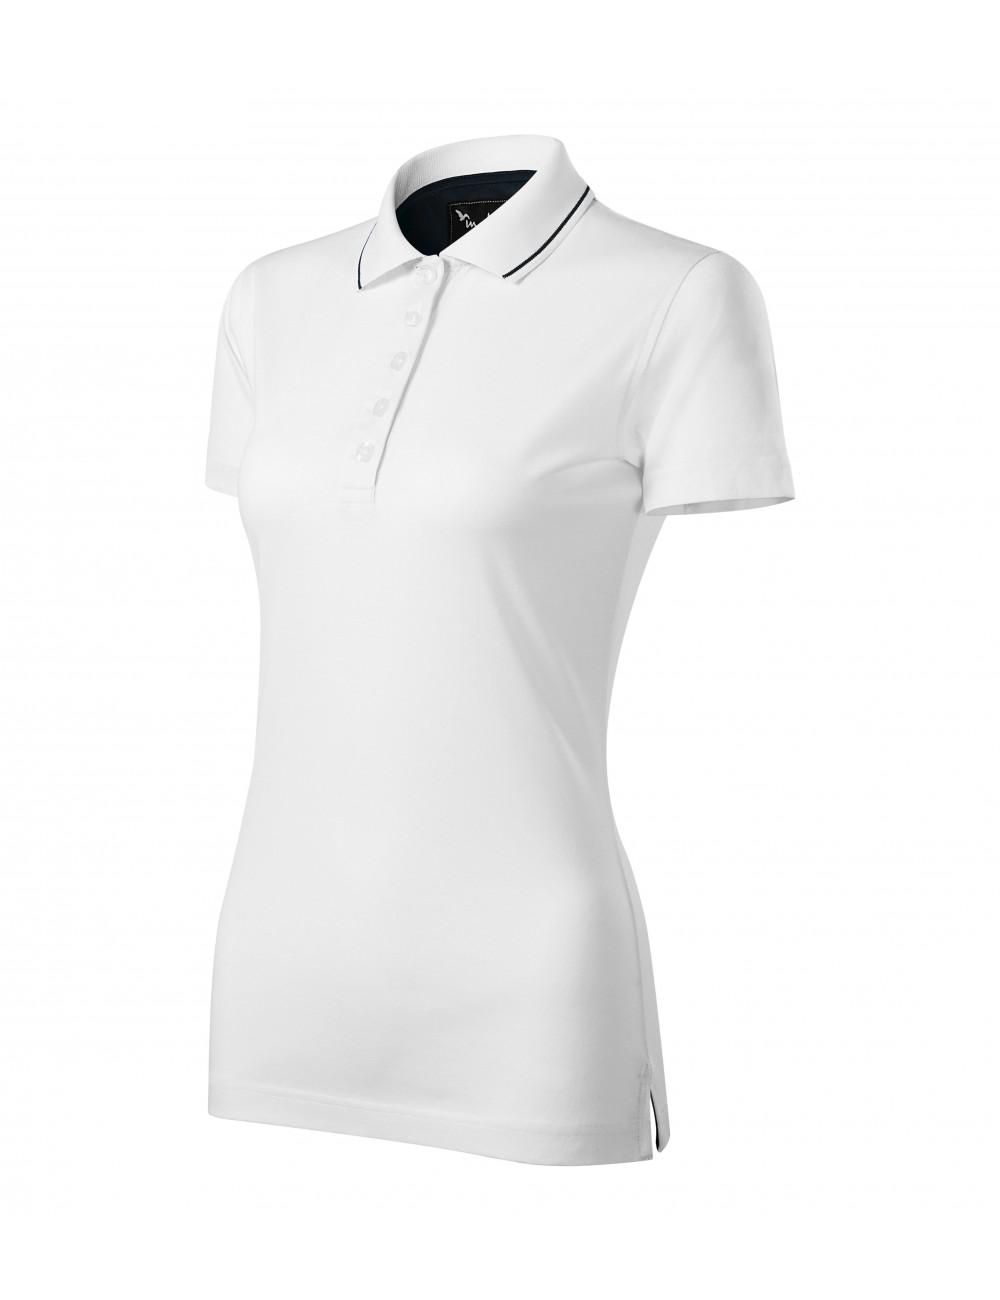 Adler MALFINIPREMIUM Koszulka polo damska Grand 269 biały